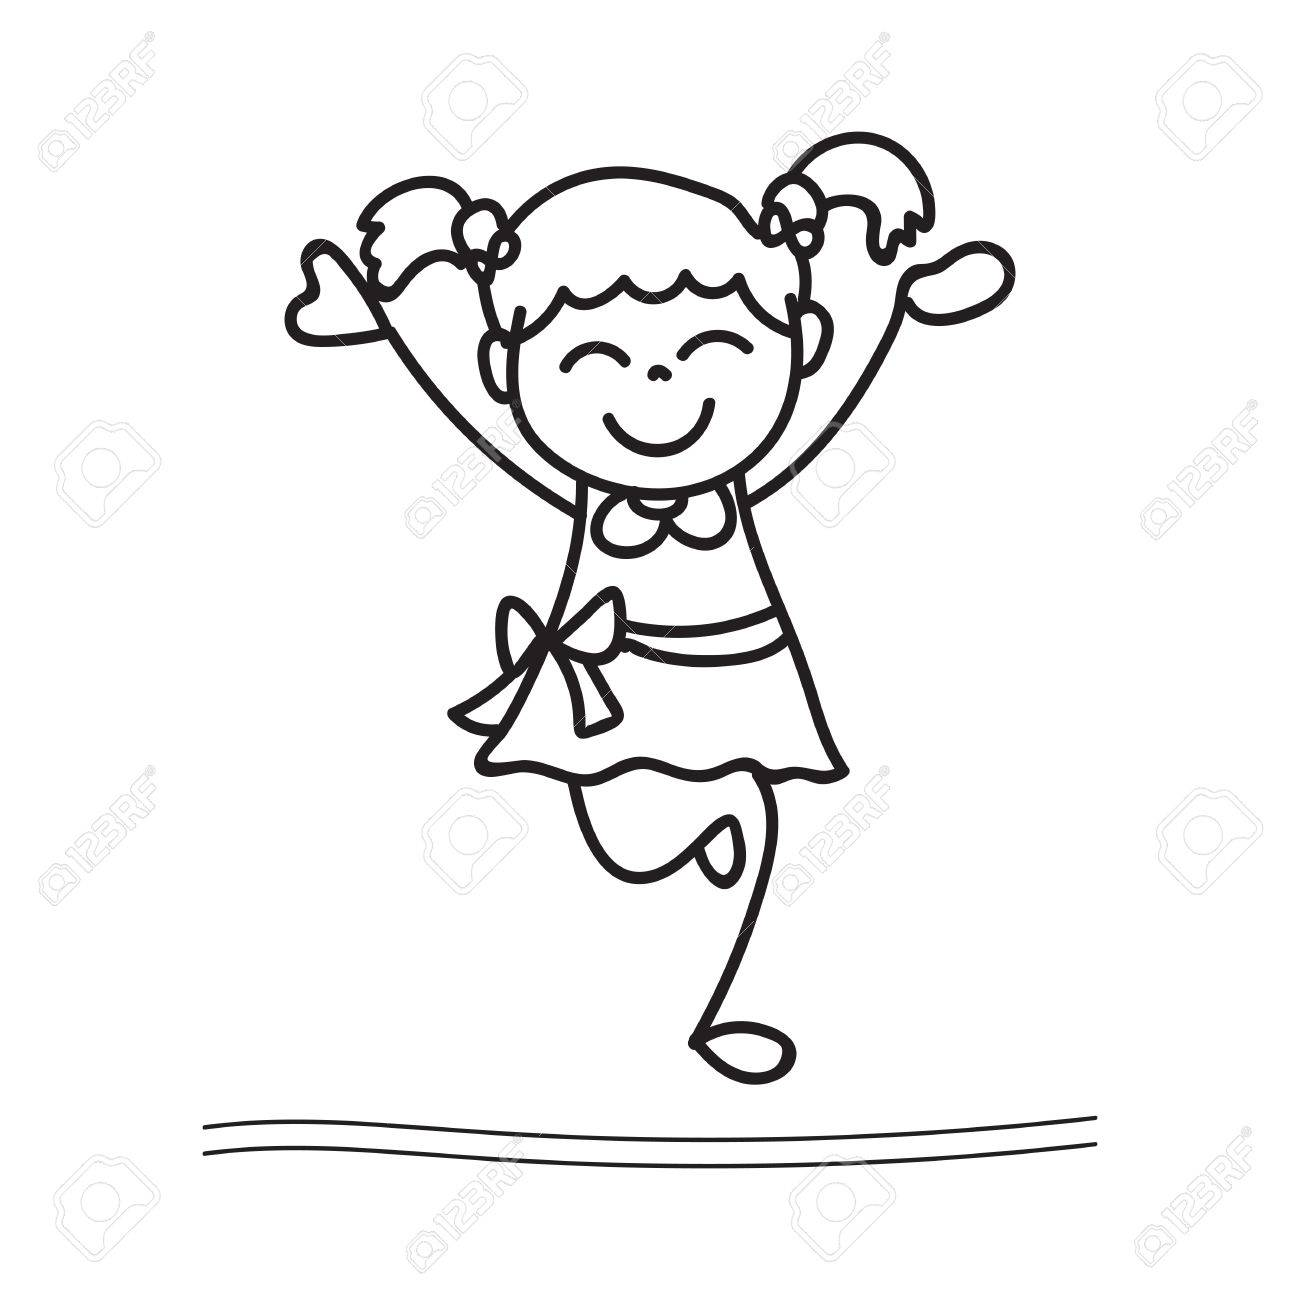 Dessin Fille main bande dessinée de dessin fille heureuse danse clip art libres